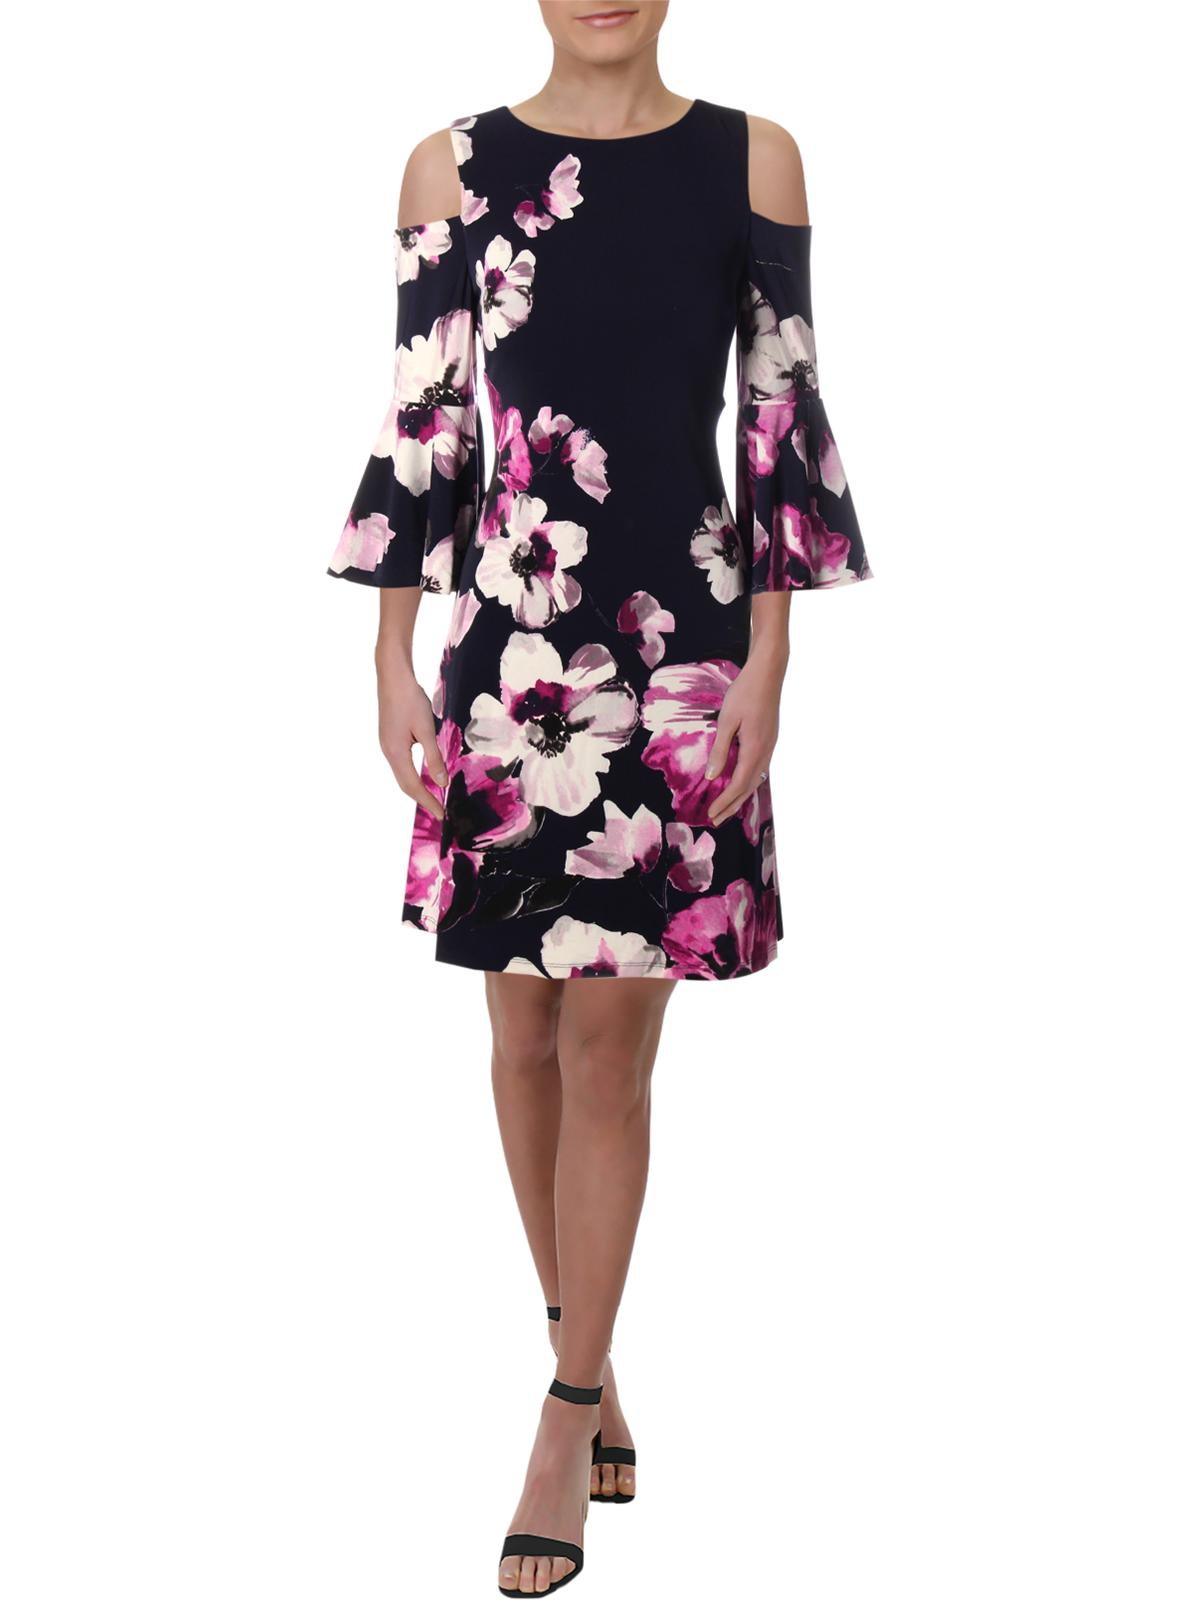 Lauren Ralph Lauren Womens Cold Shoulder Mini Cocktail Dress